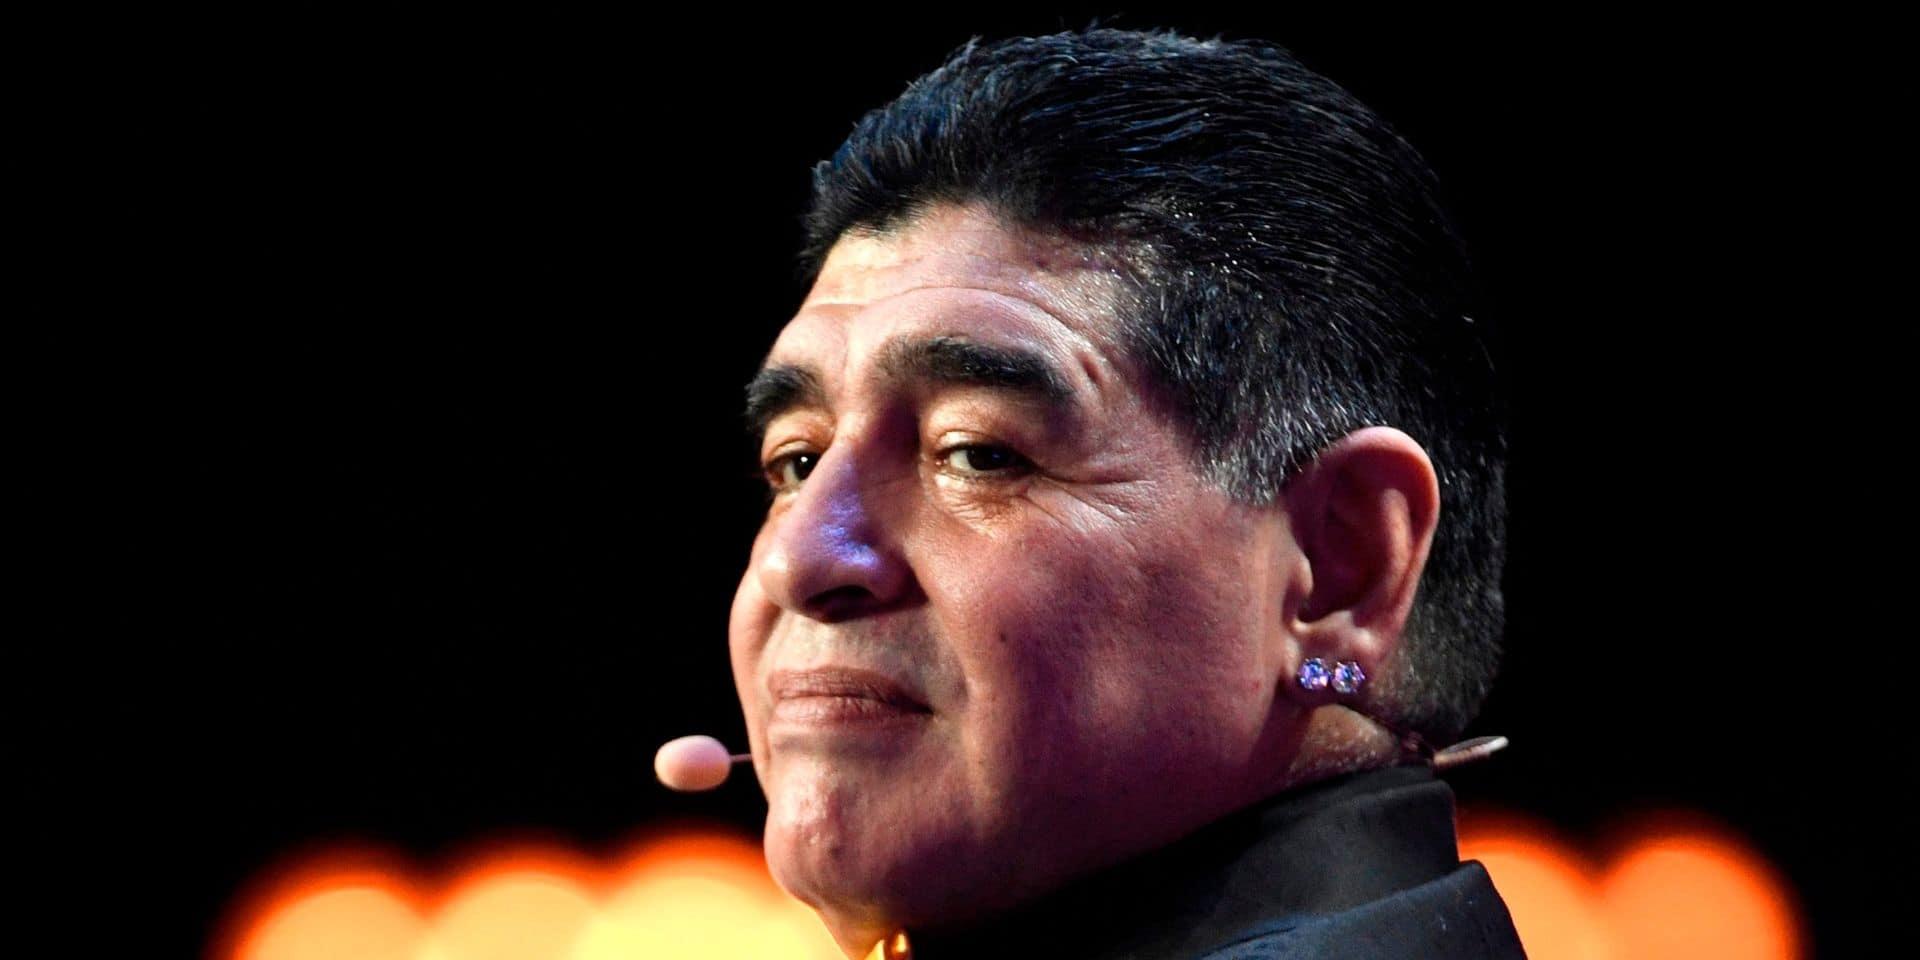 Diego Maradona devrait sortir de l'hôpital rapidement, selon son médecin